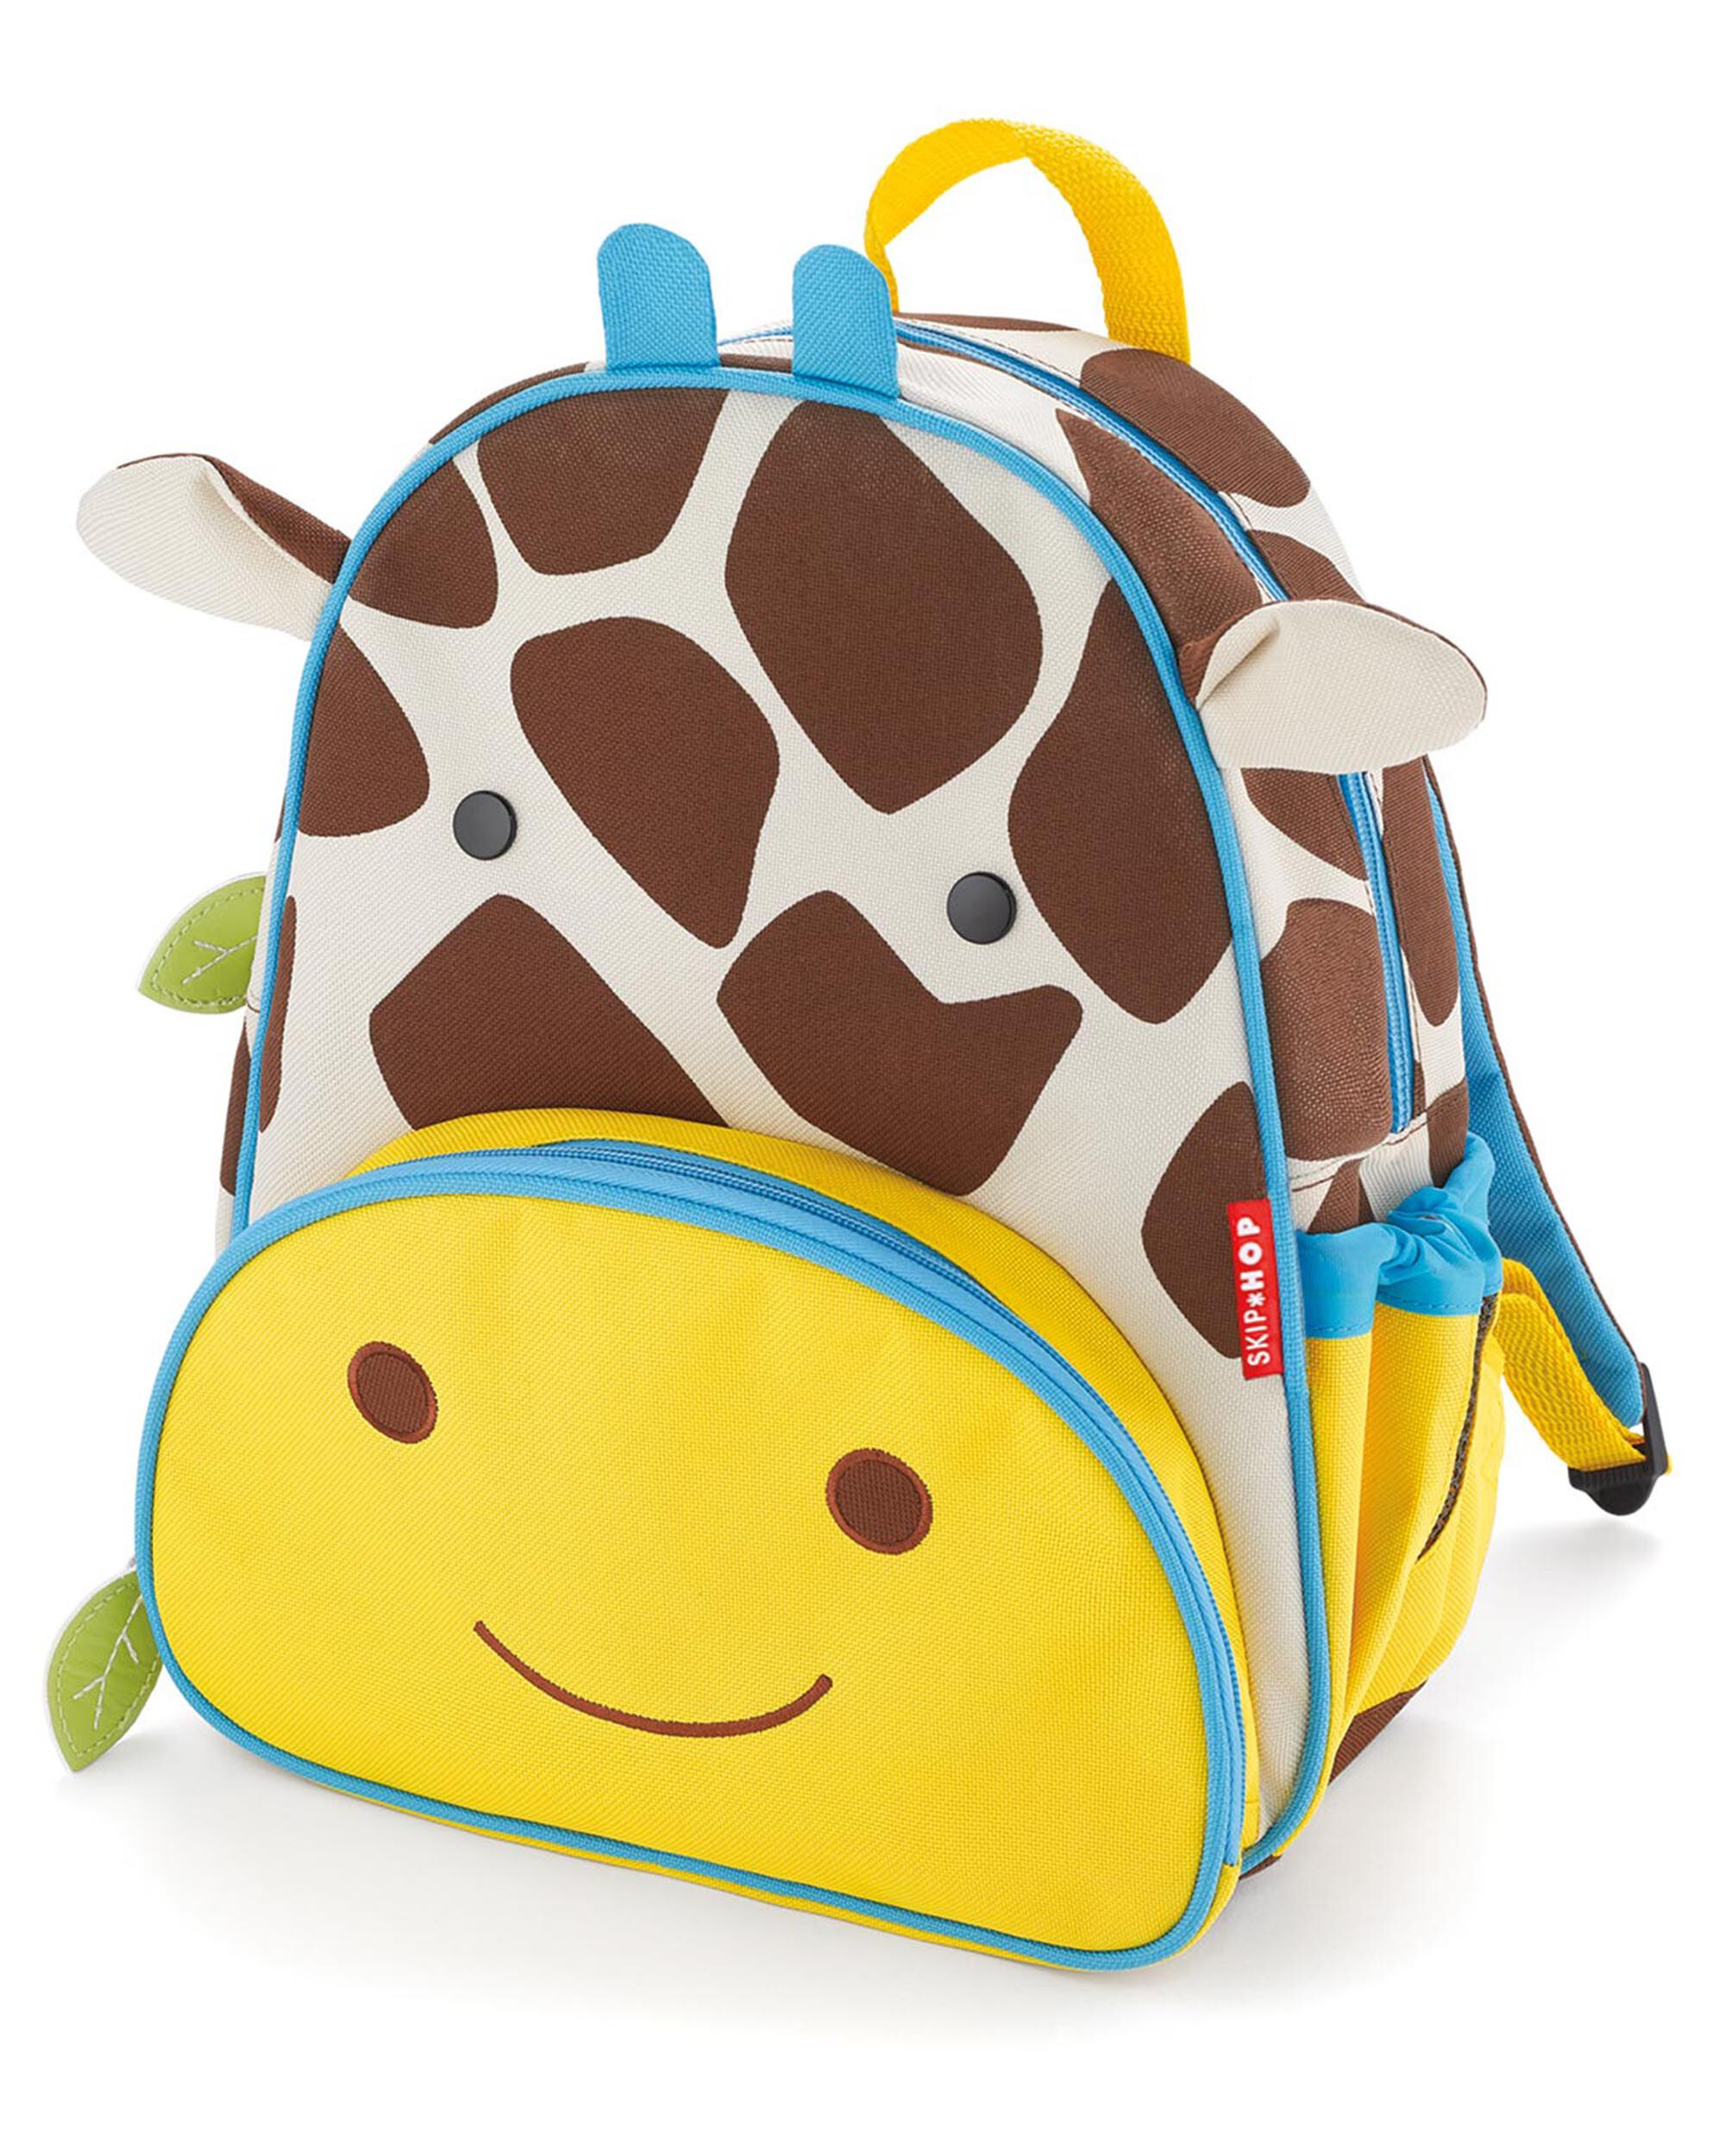 Skip Hop Little Kid Zoo Backpack PreSchool  School Bag For Boys /& Girls